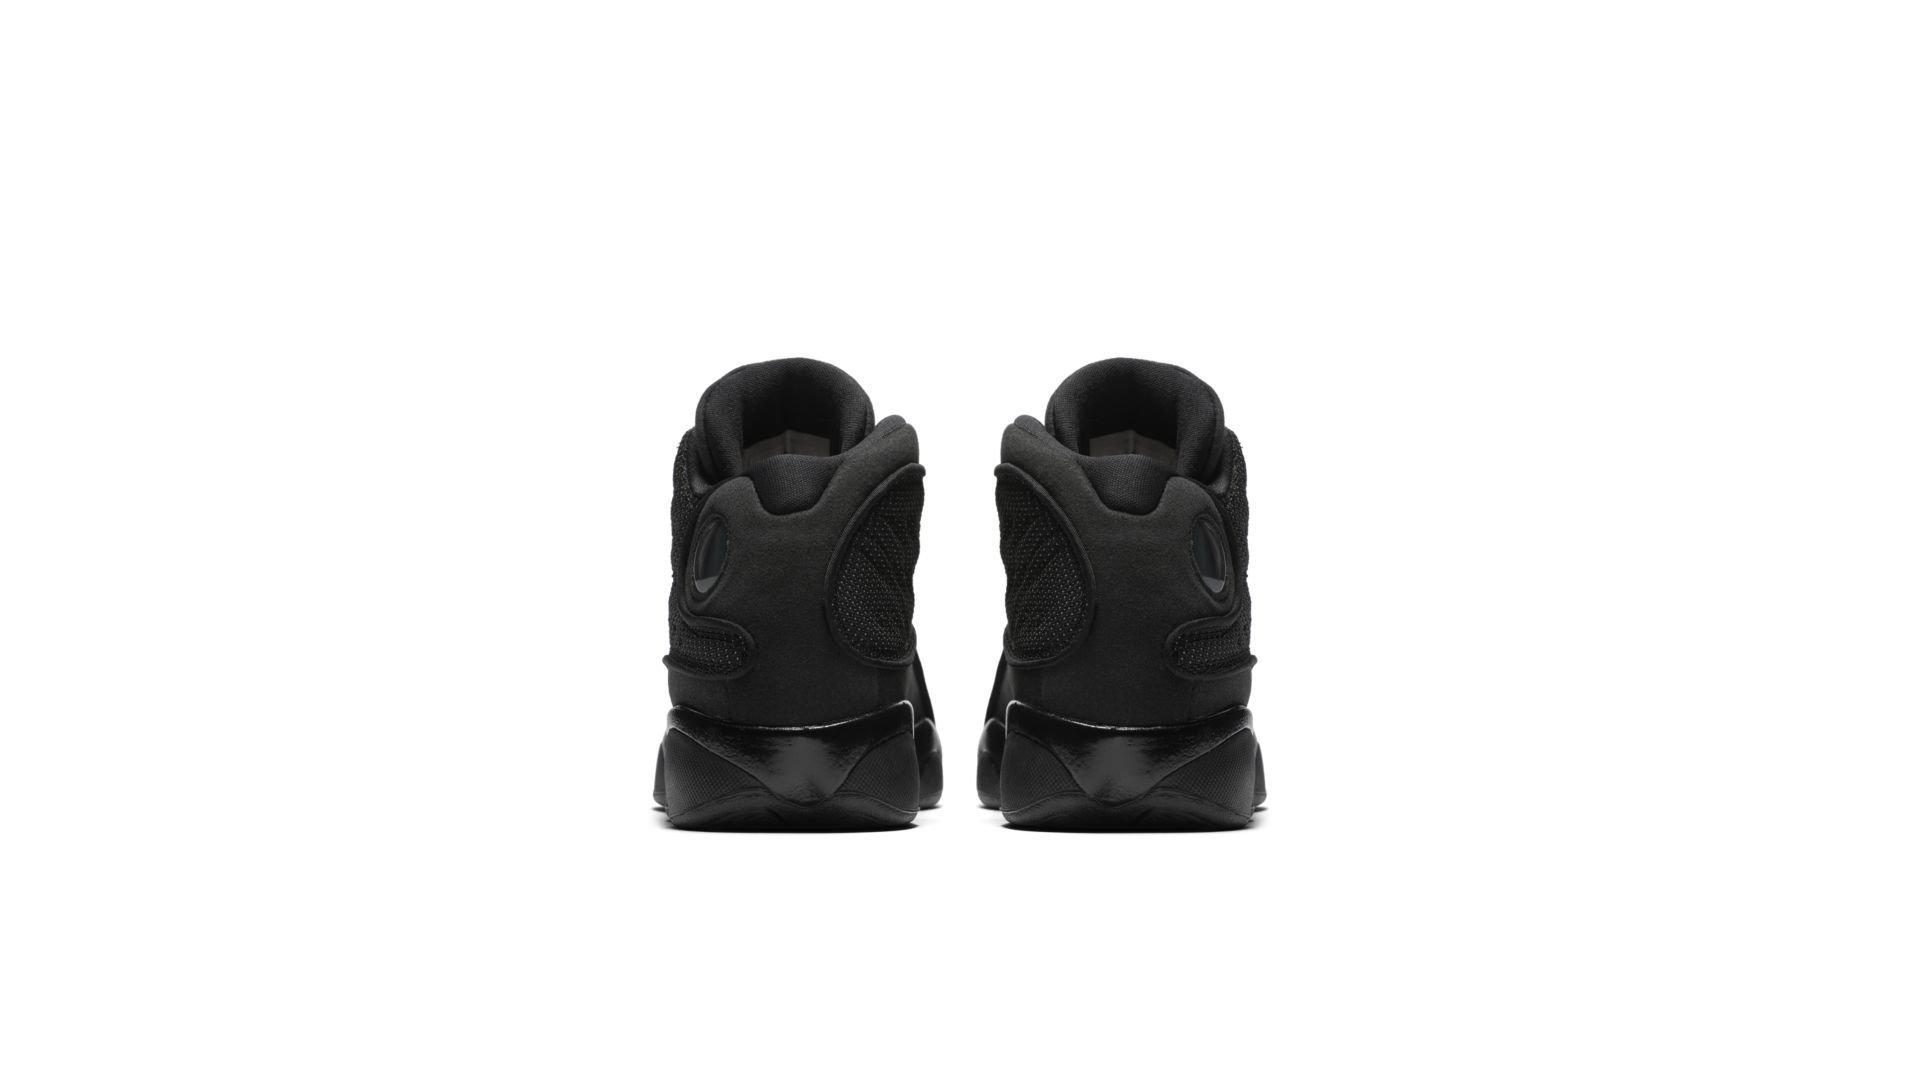 Jordan 13 Retro Black Cat (GS) (884129-011)